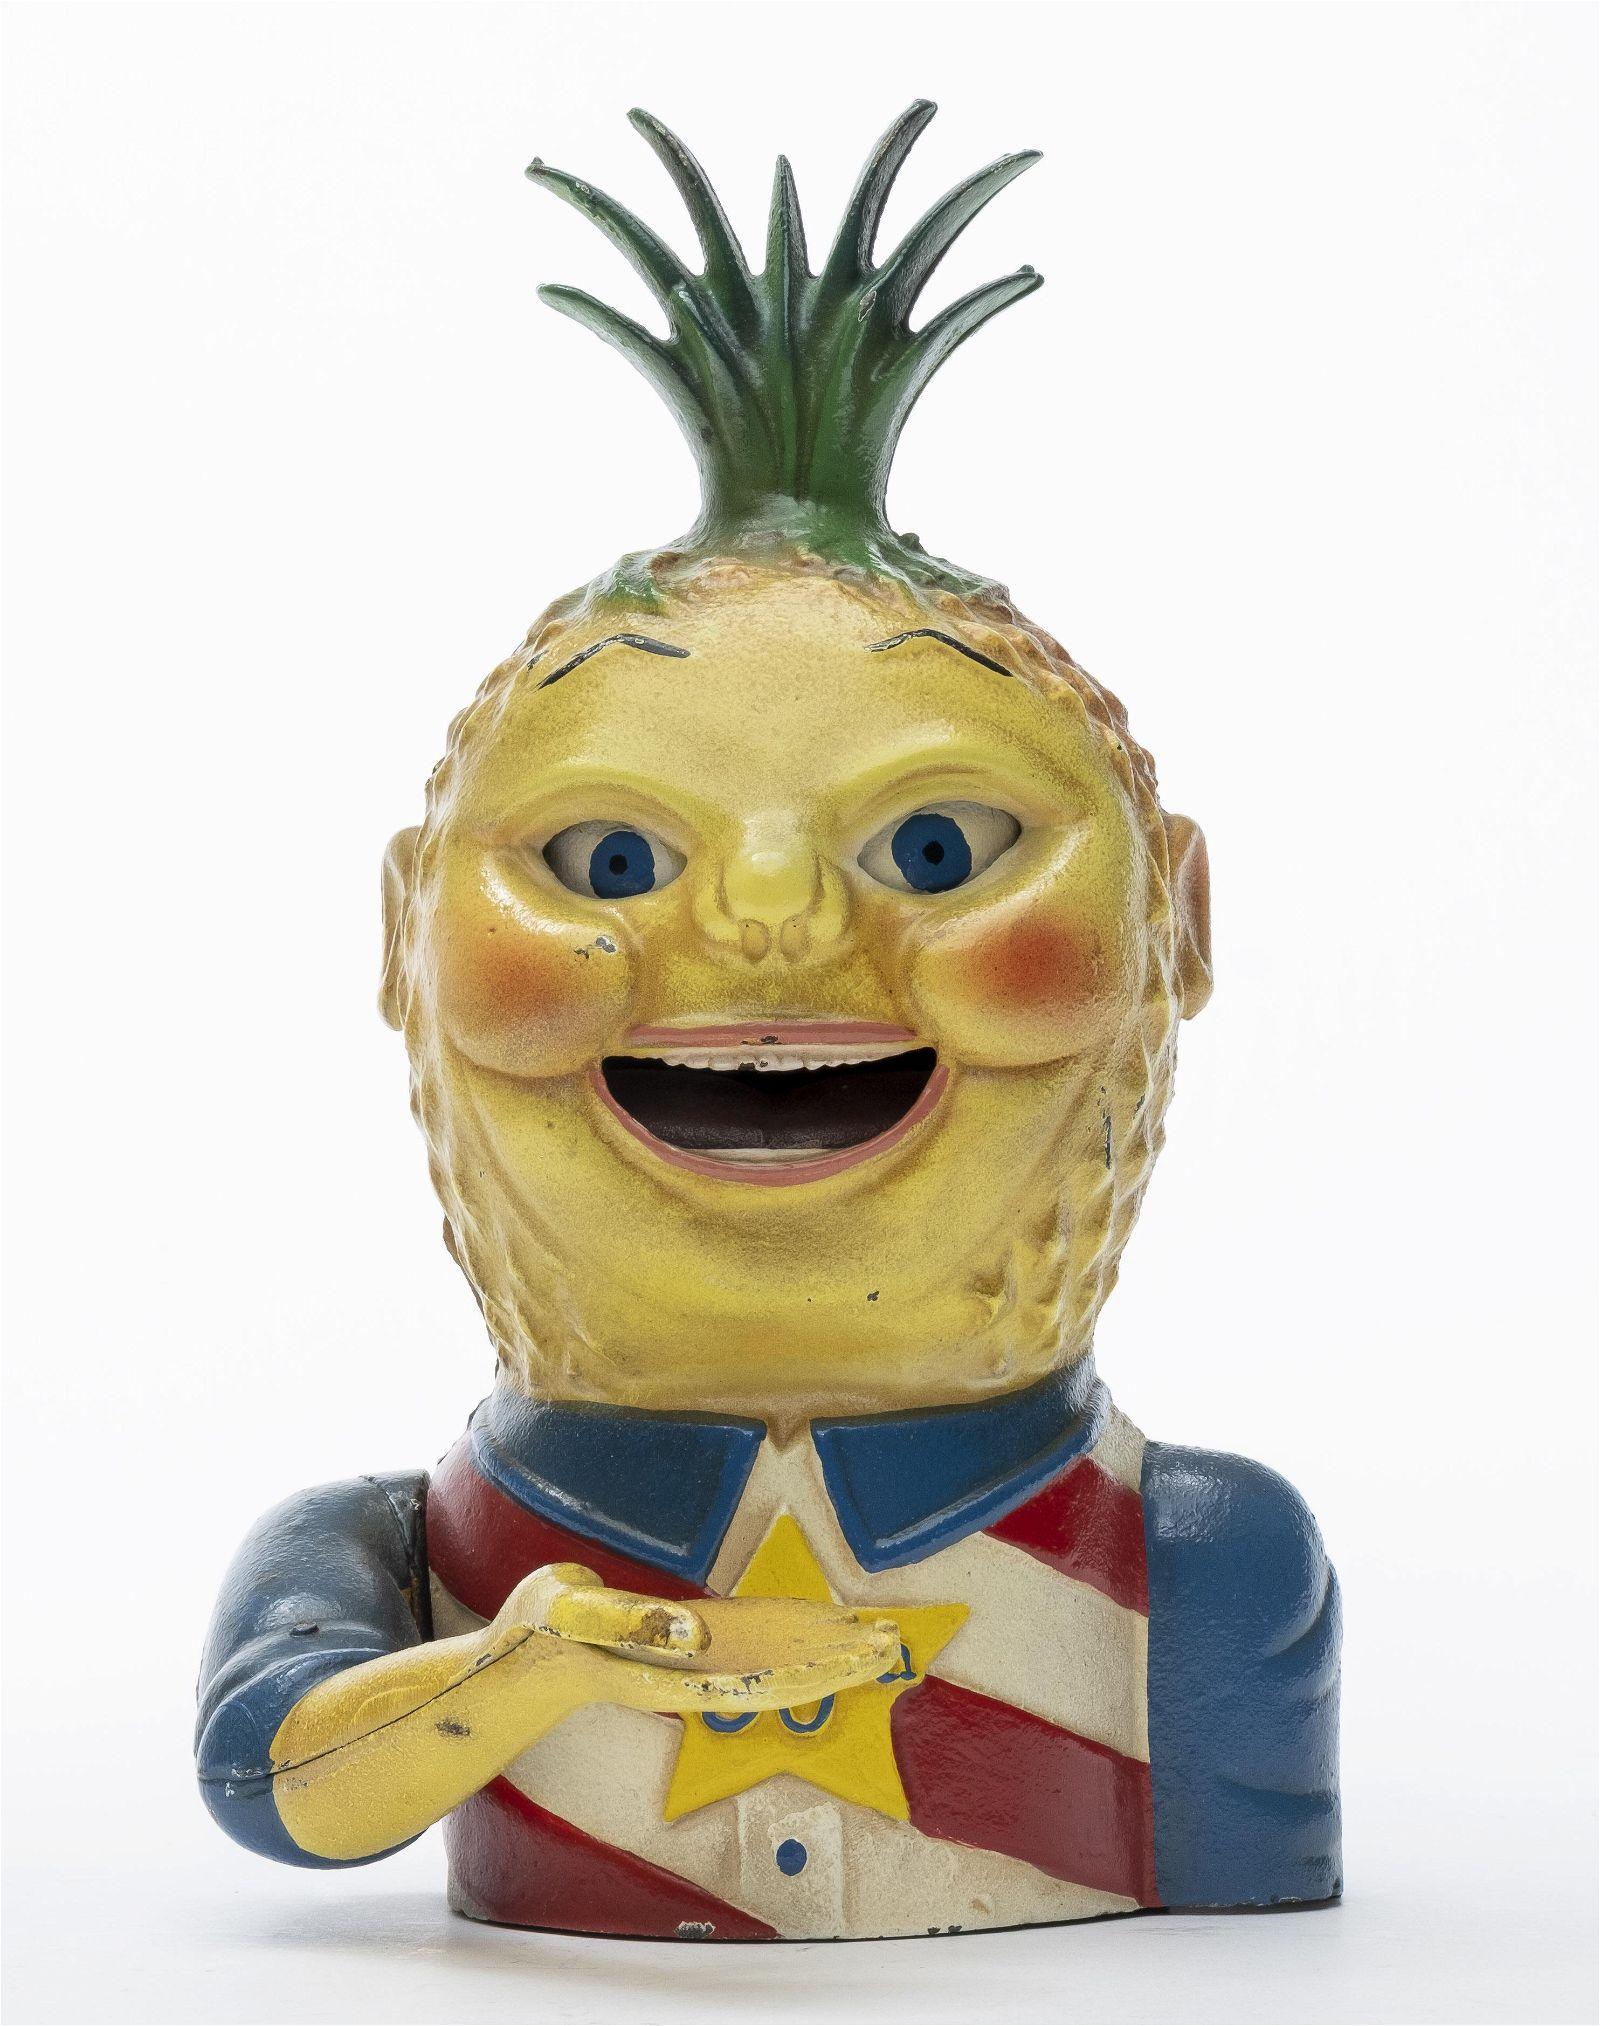 Penny Pineapple Cast Iron Mechanical Bank